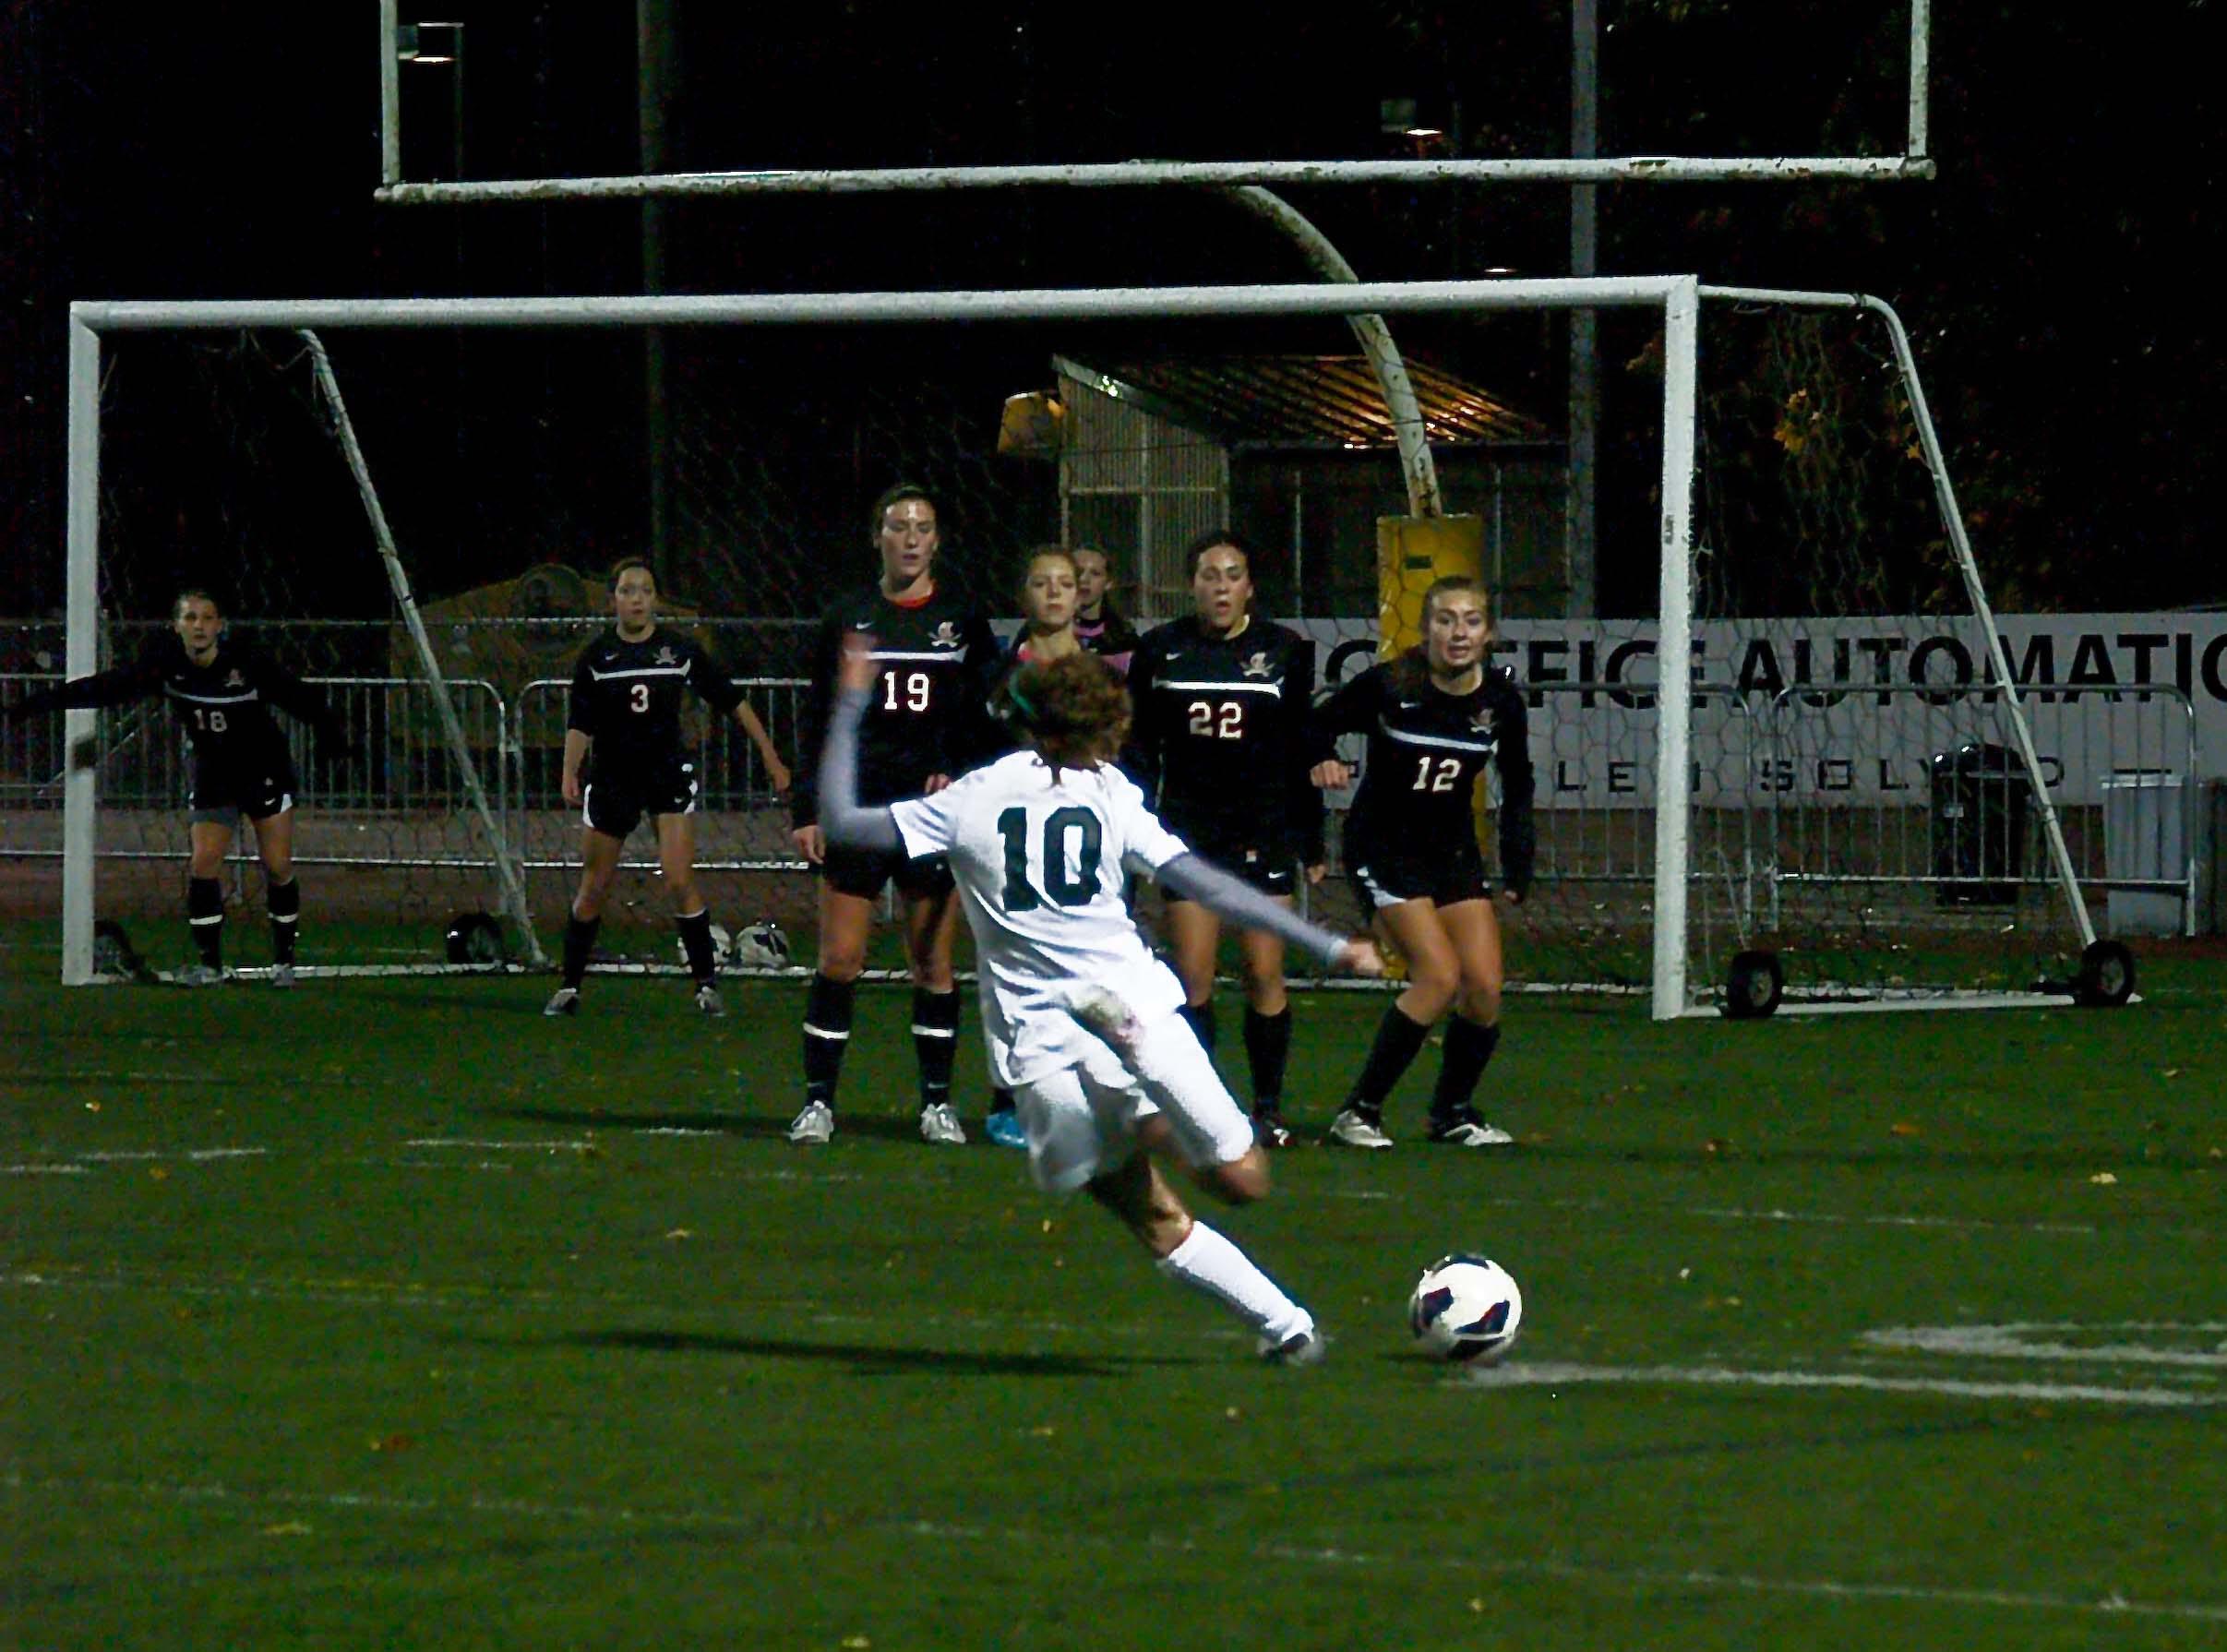 West Linn girls soccer prepare for playoffs